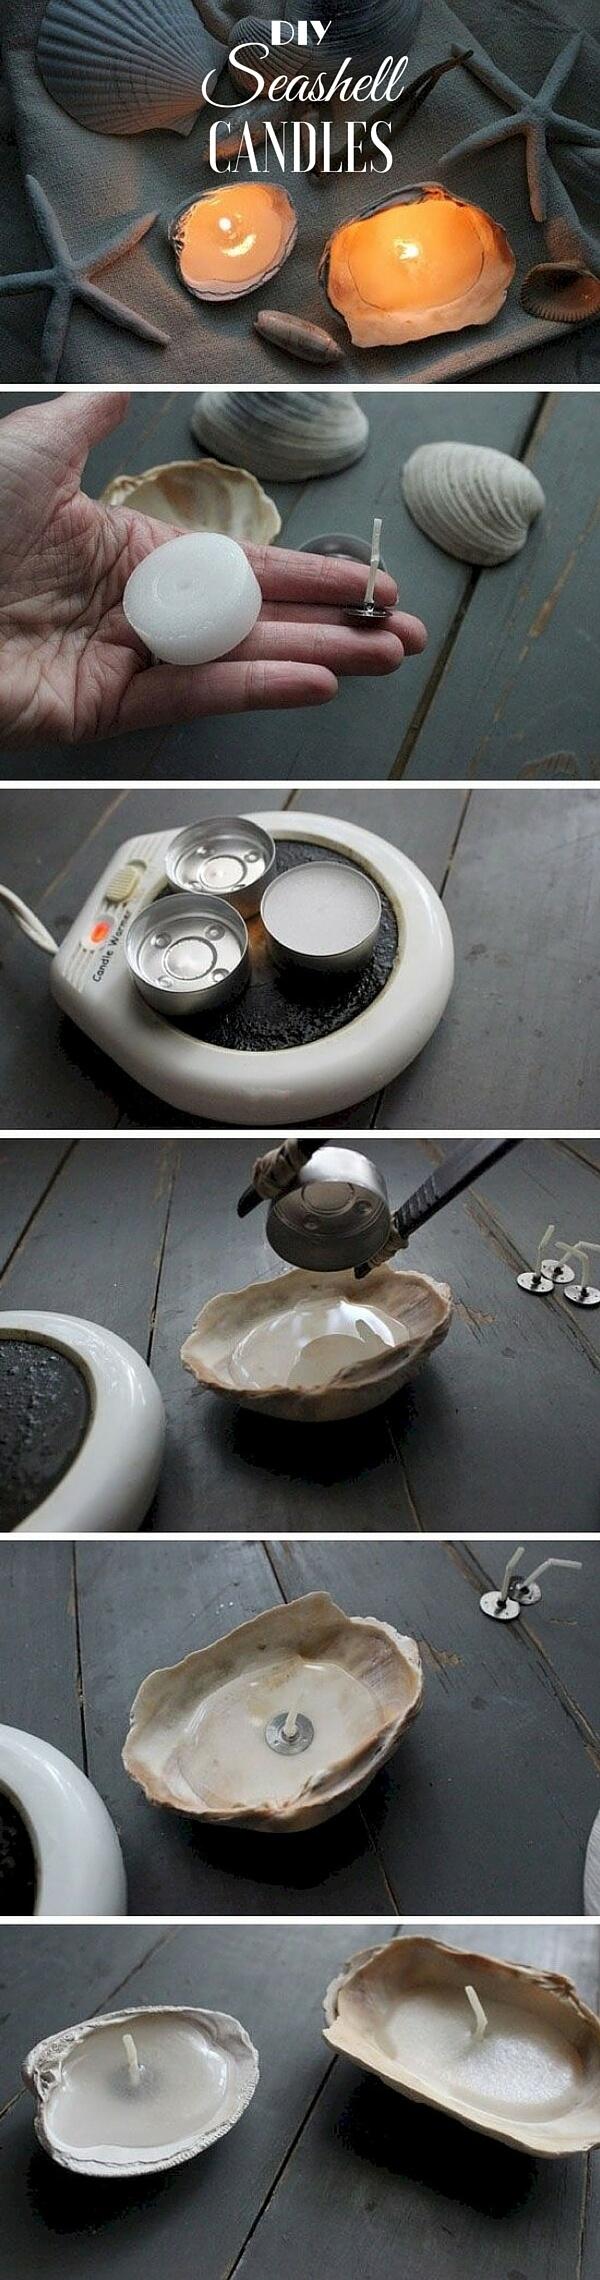 seashell-candles-k4craft